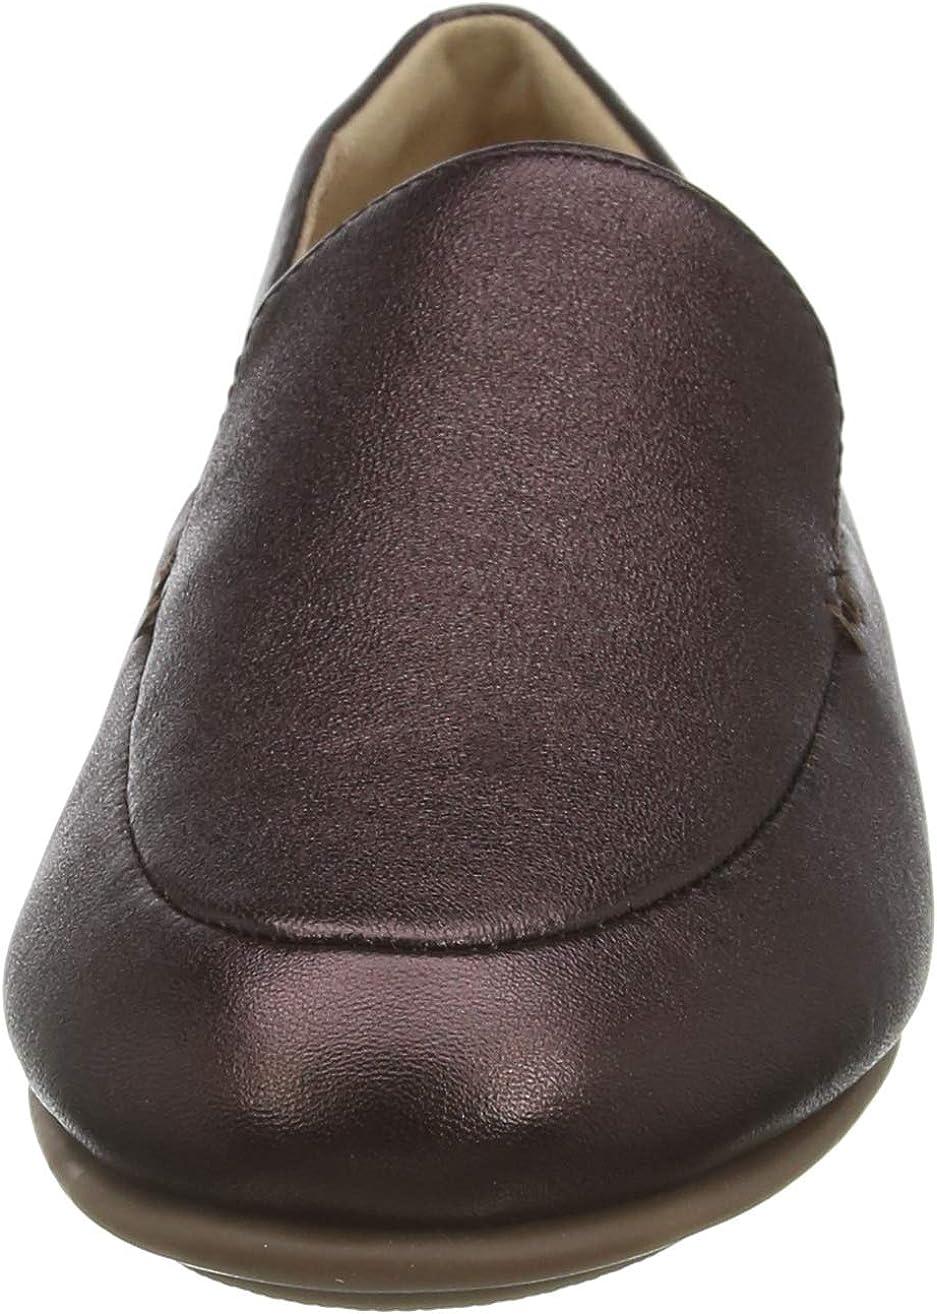 Fitflop Damen Lena Loafer Slipper, beige Braun Chocolate Brown 167 Zk3dw